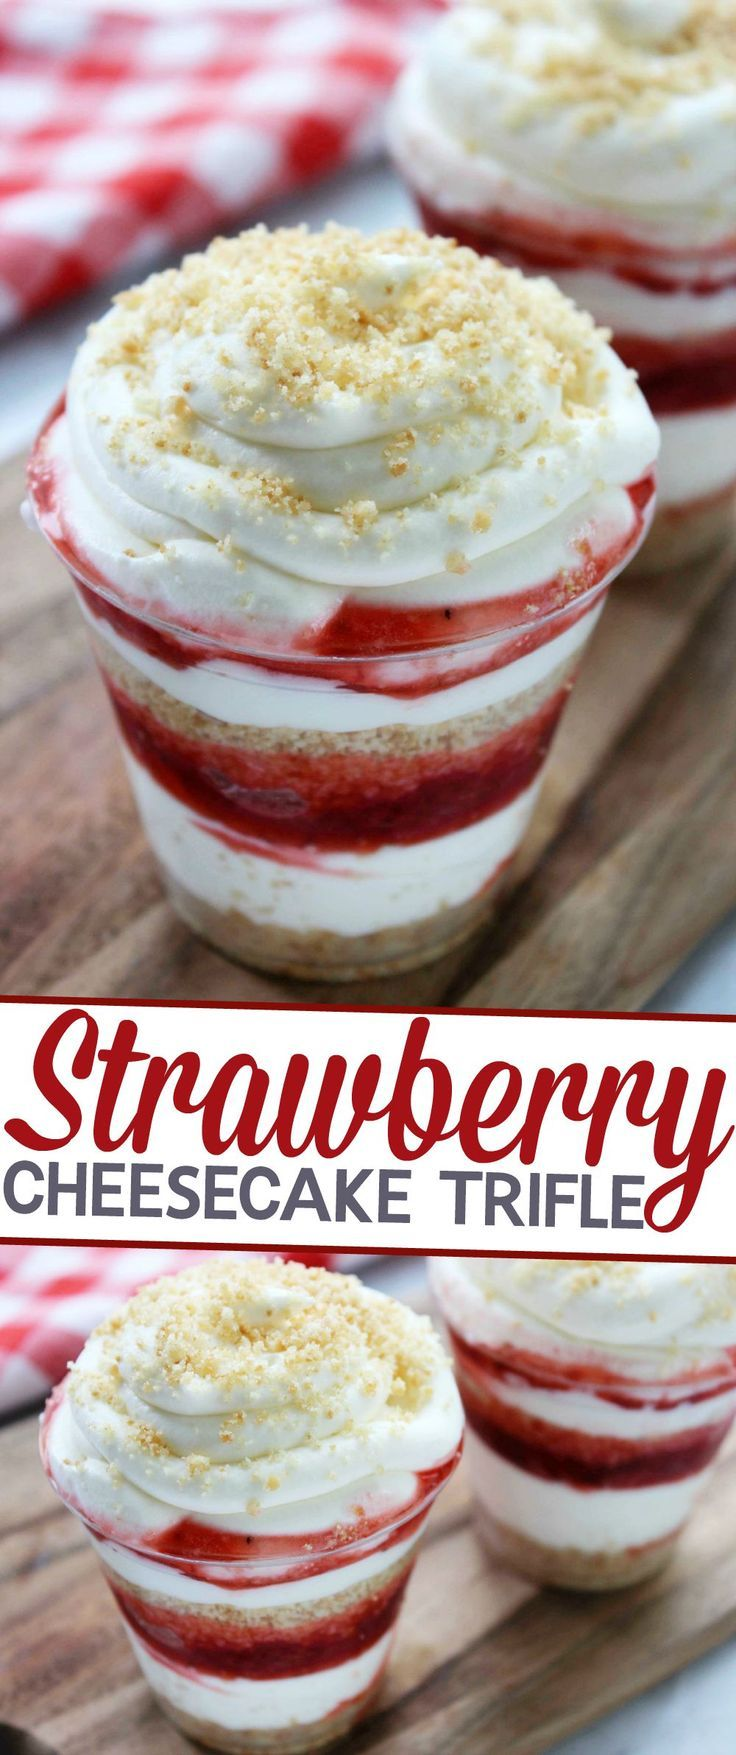 Strawberry Cheesecake Trifle Recipe Sweet Treats